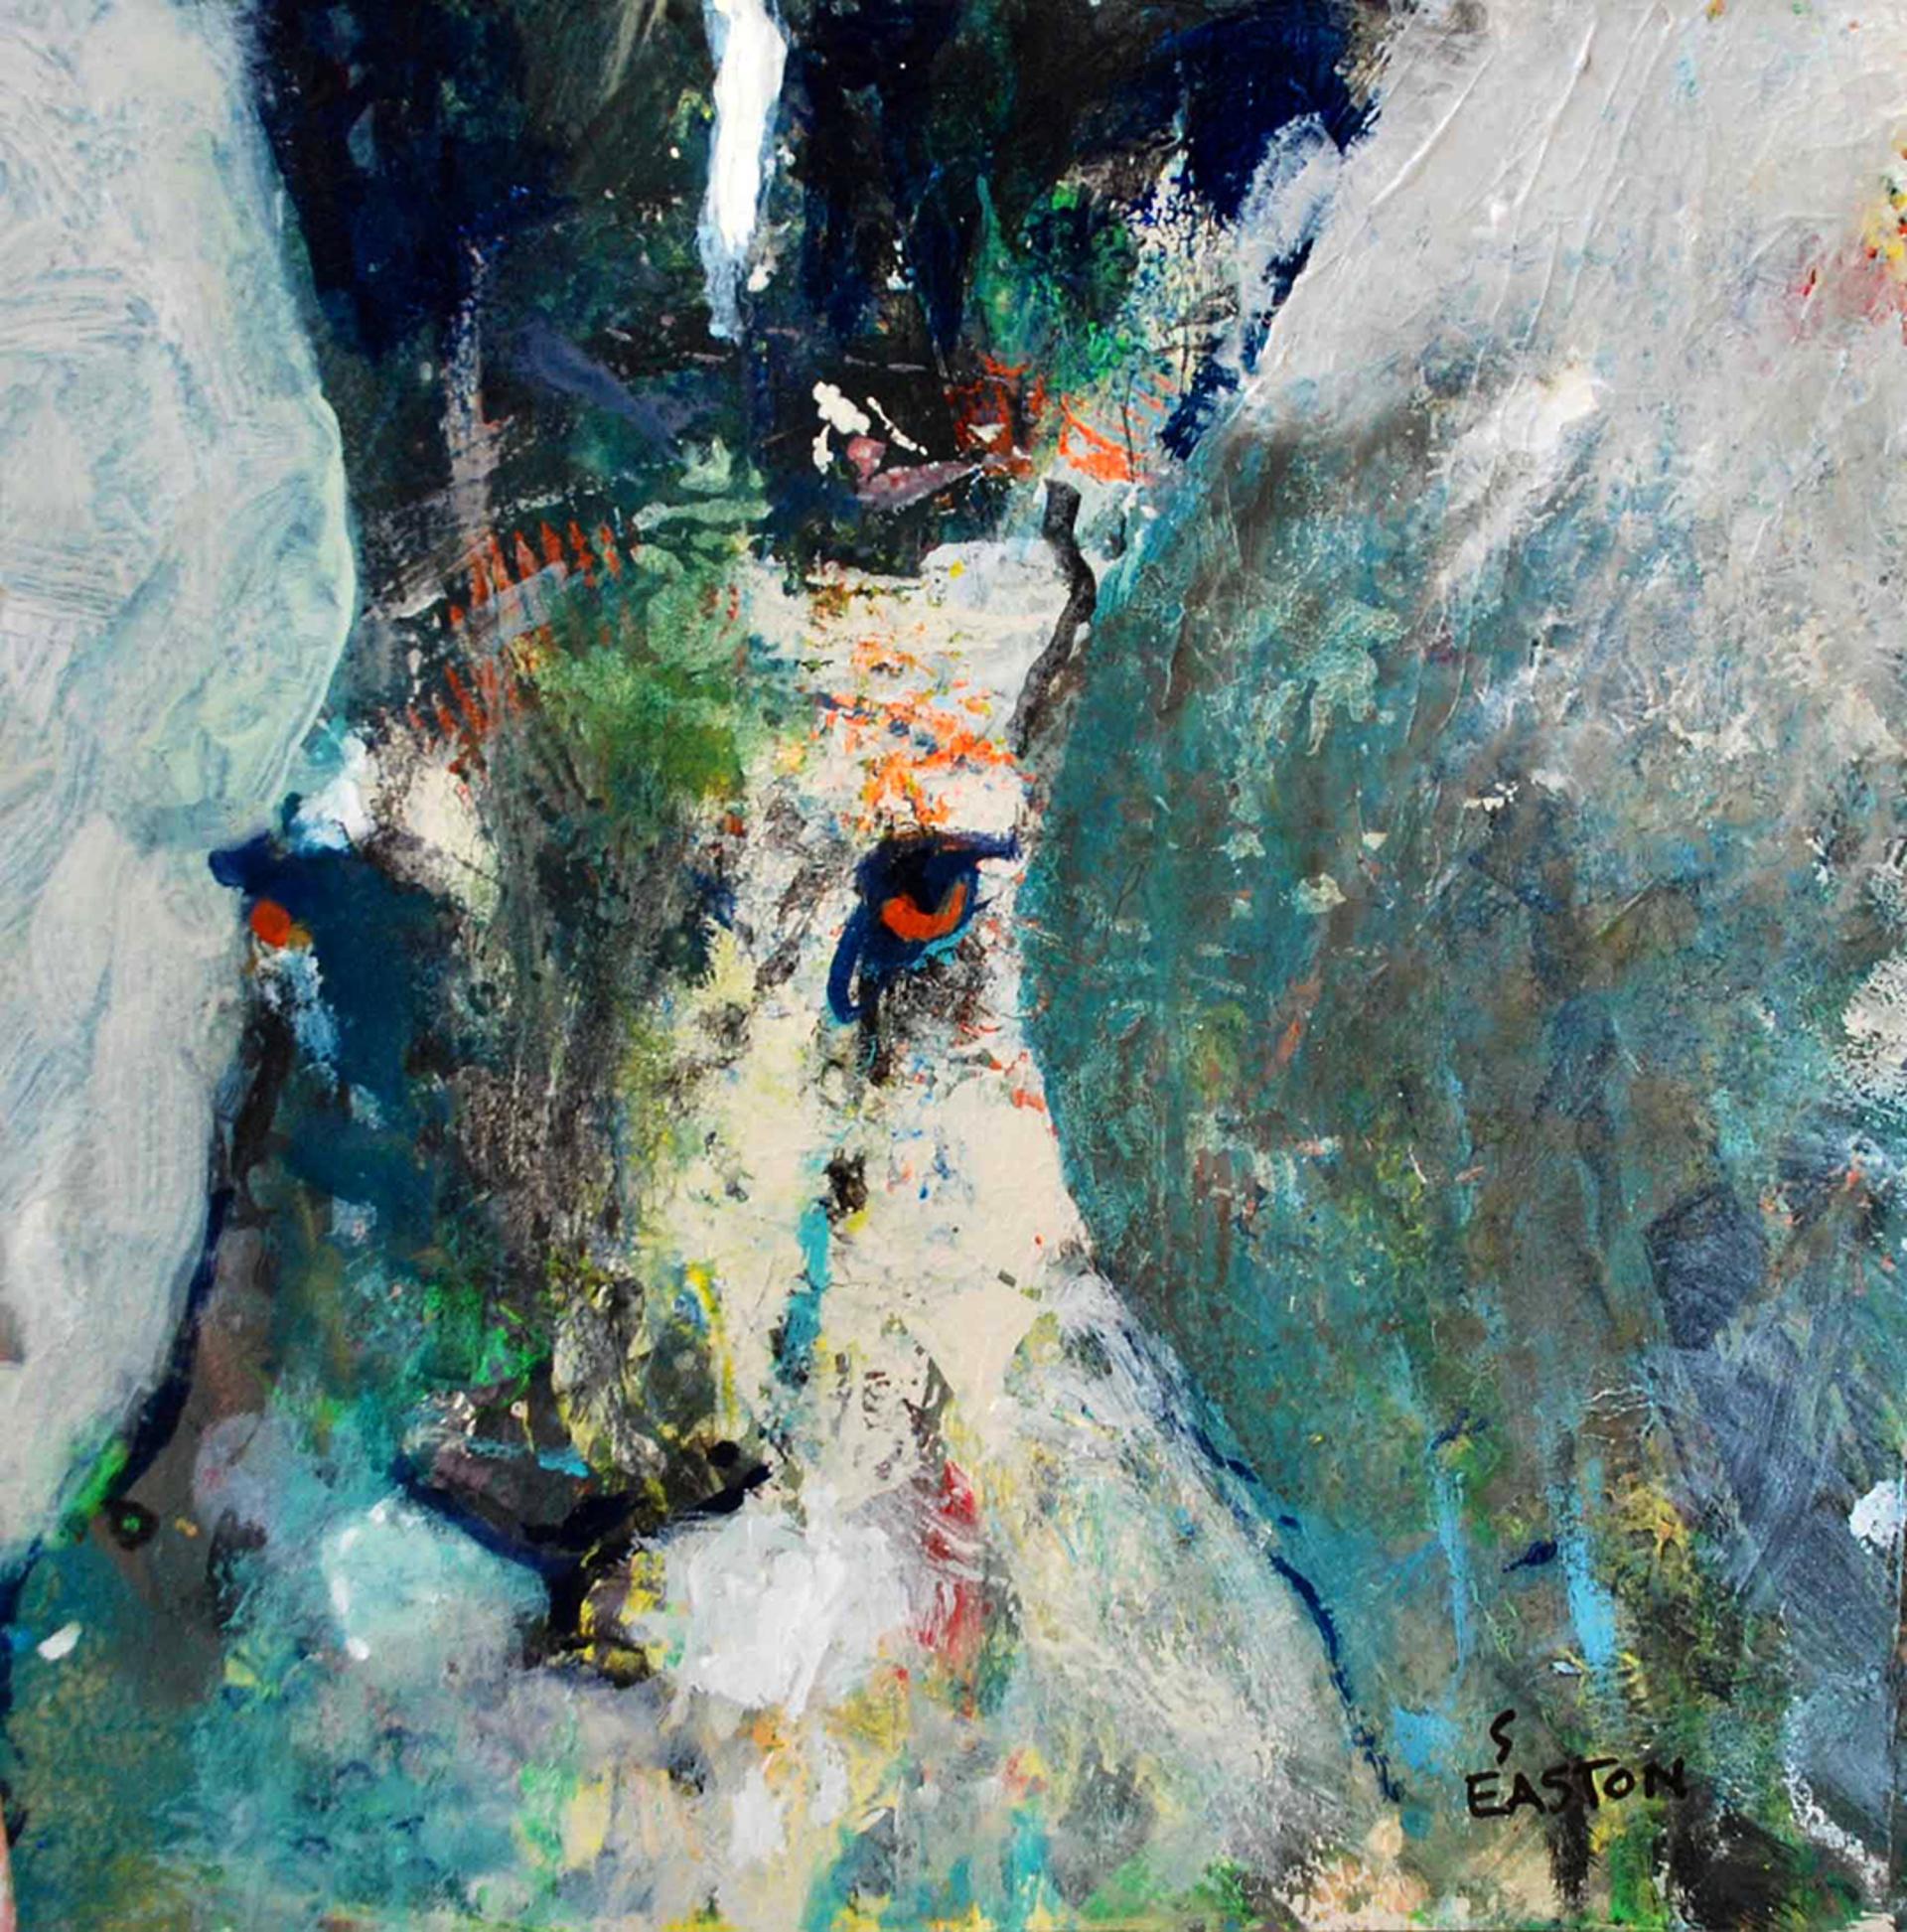 Next by Susan Easton Burns